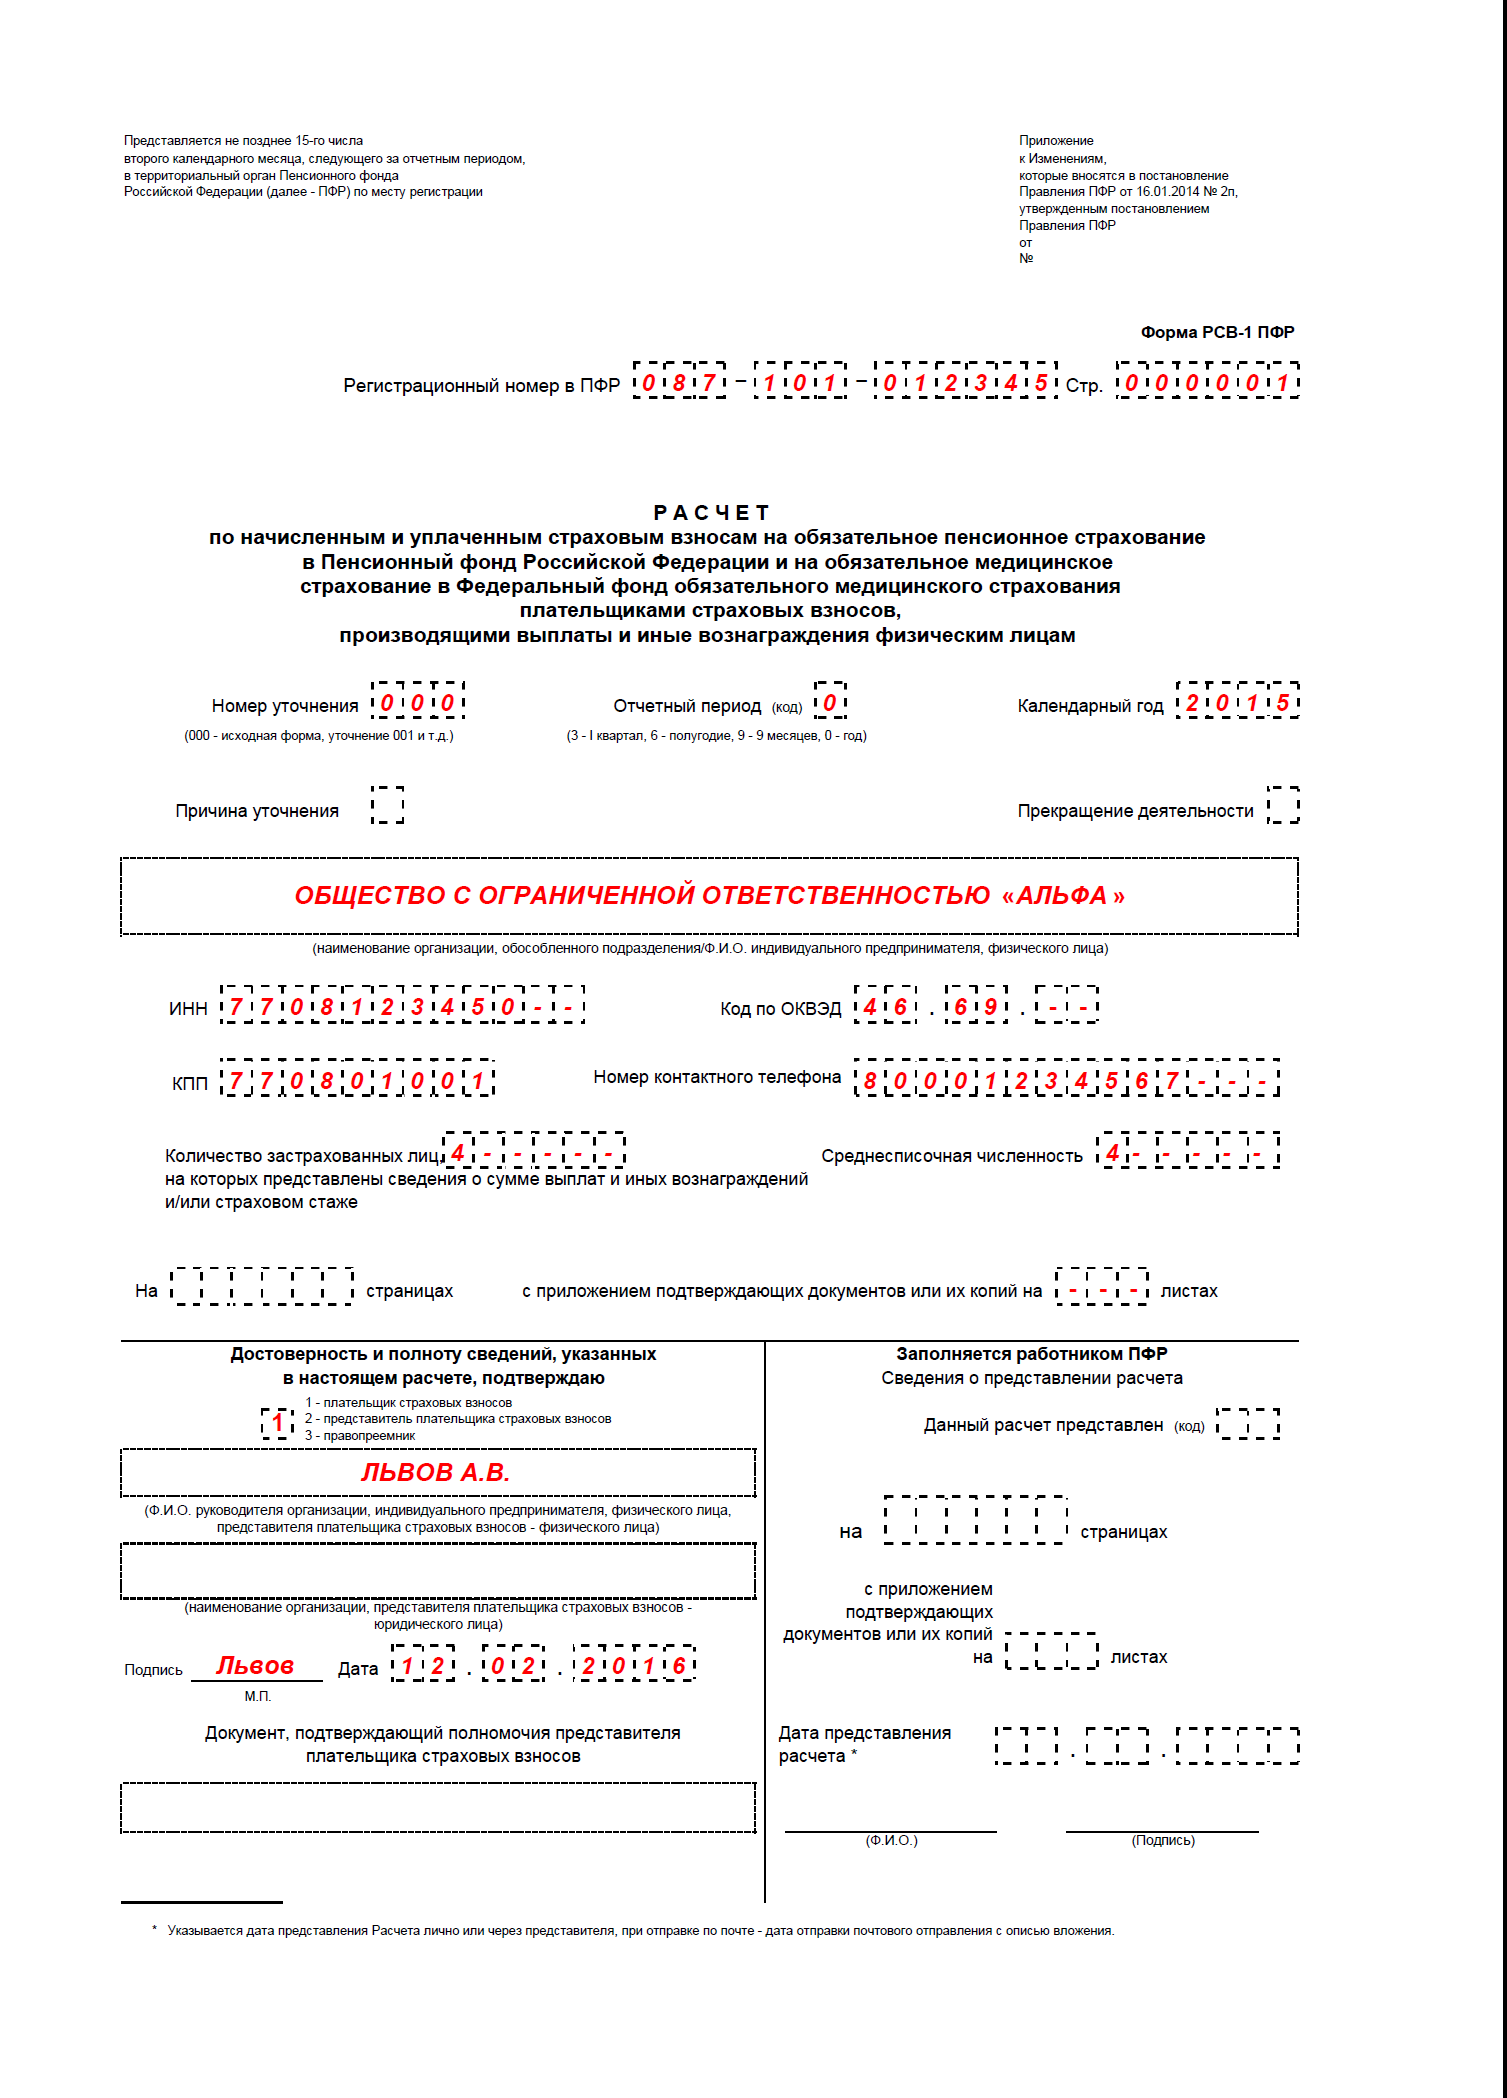 Образец формы РСВ 1 ПФР за 9 месяцев 2014 года